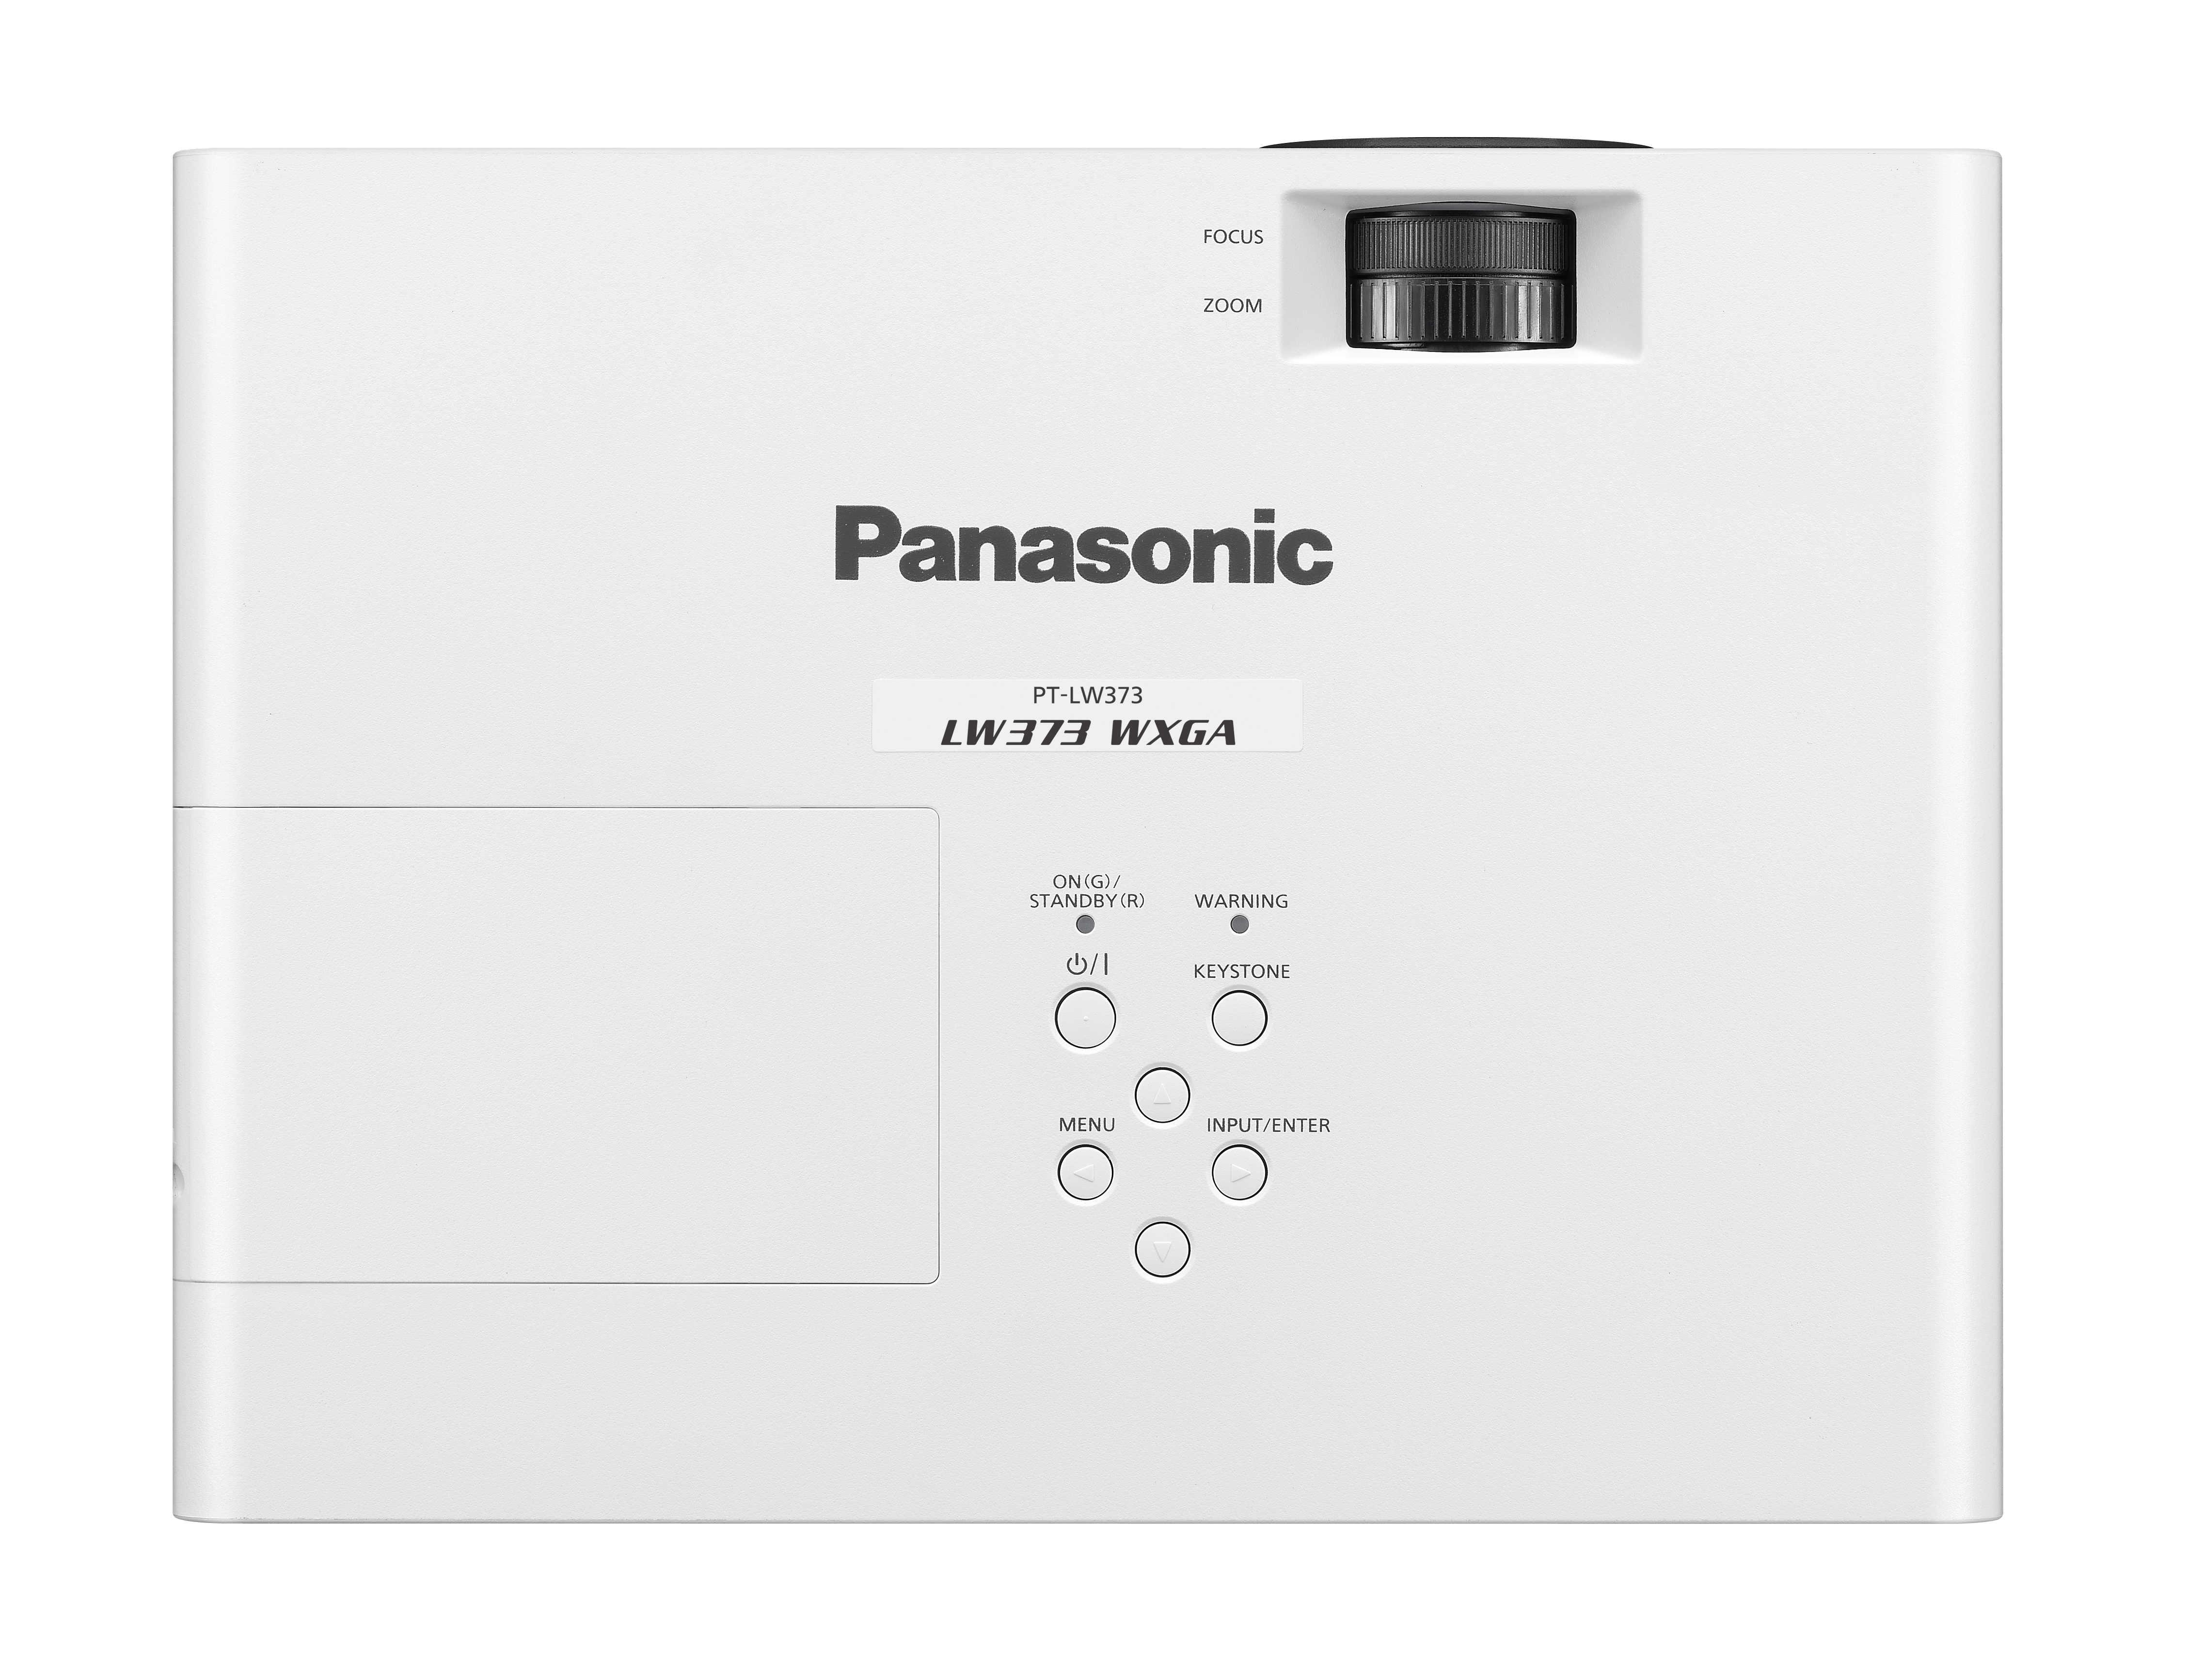 3600 Lumen WXGA LCD Projector